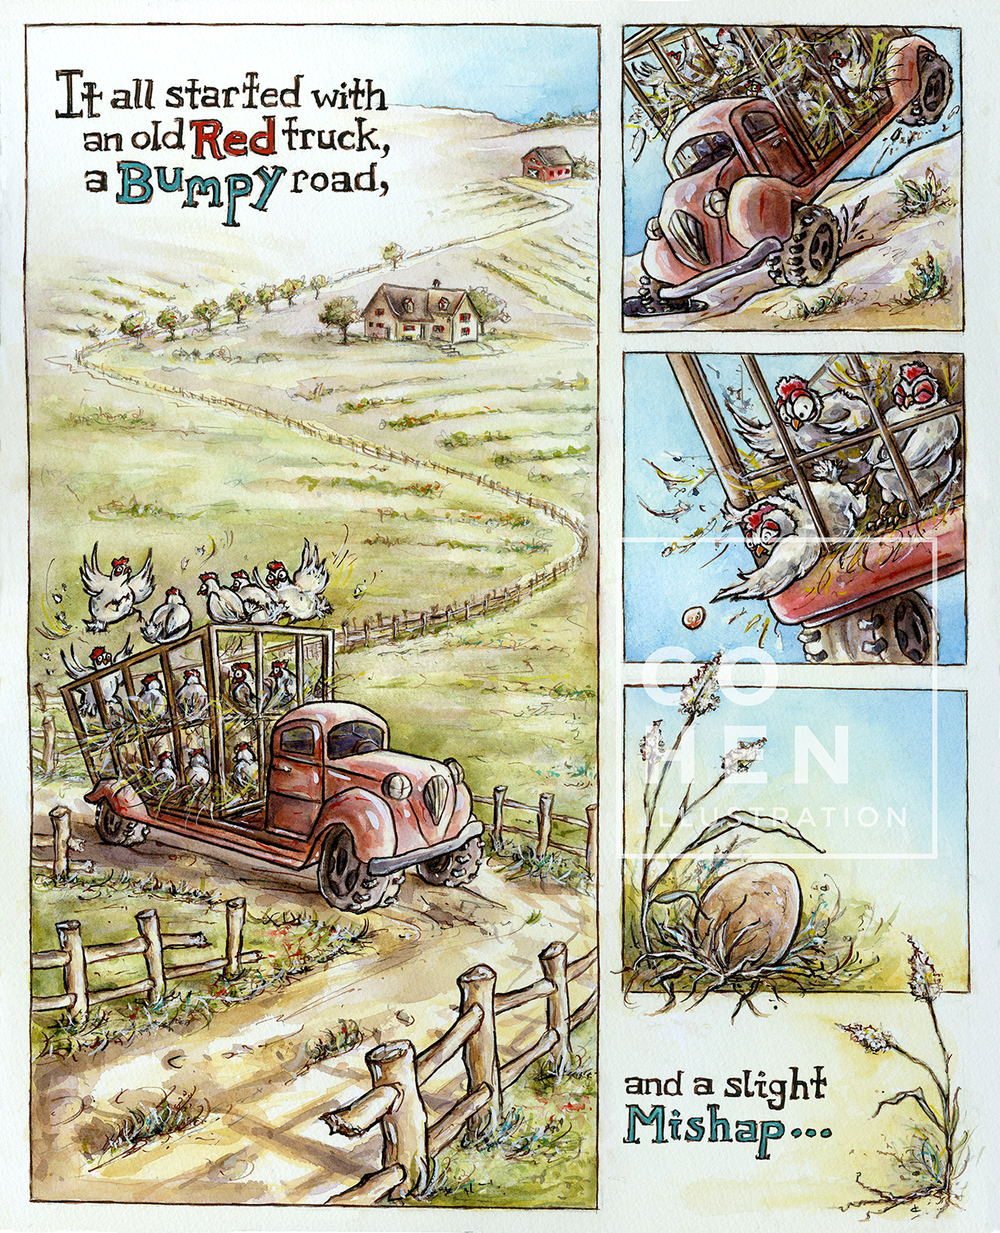 cohen-illustration-chicken-childrensbooks.png